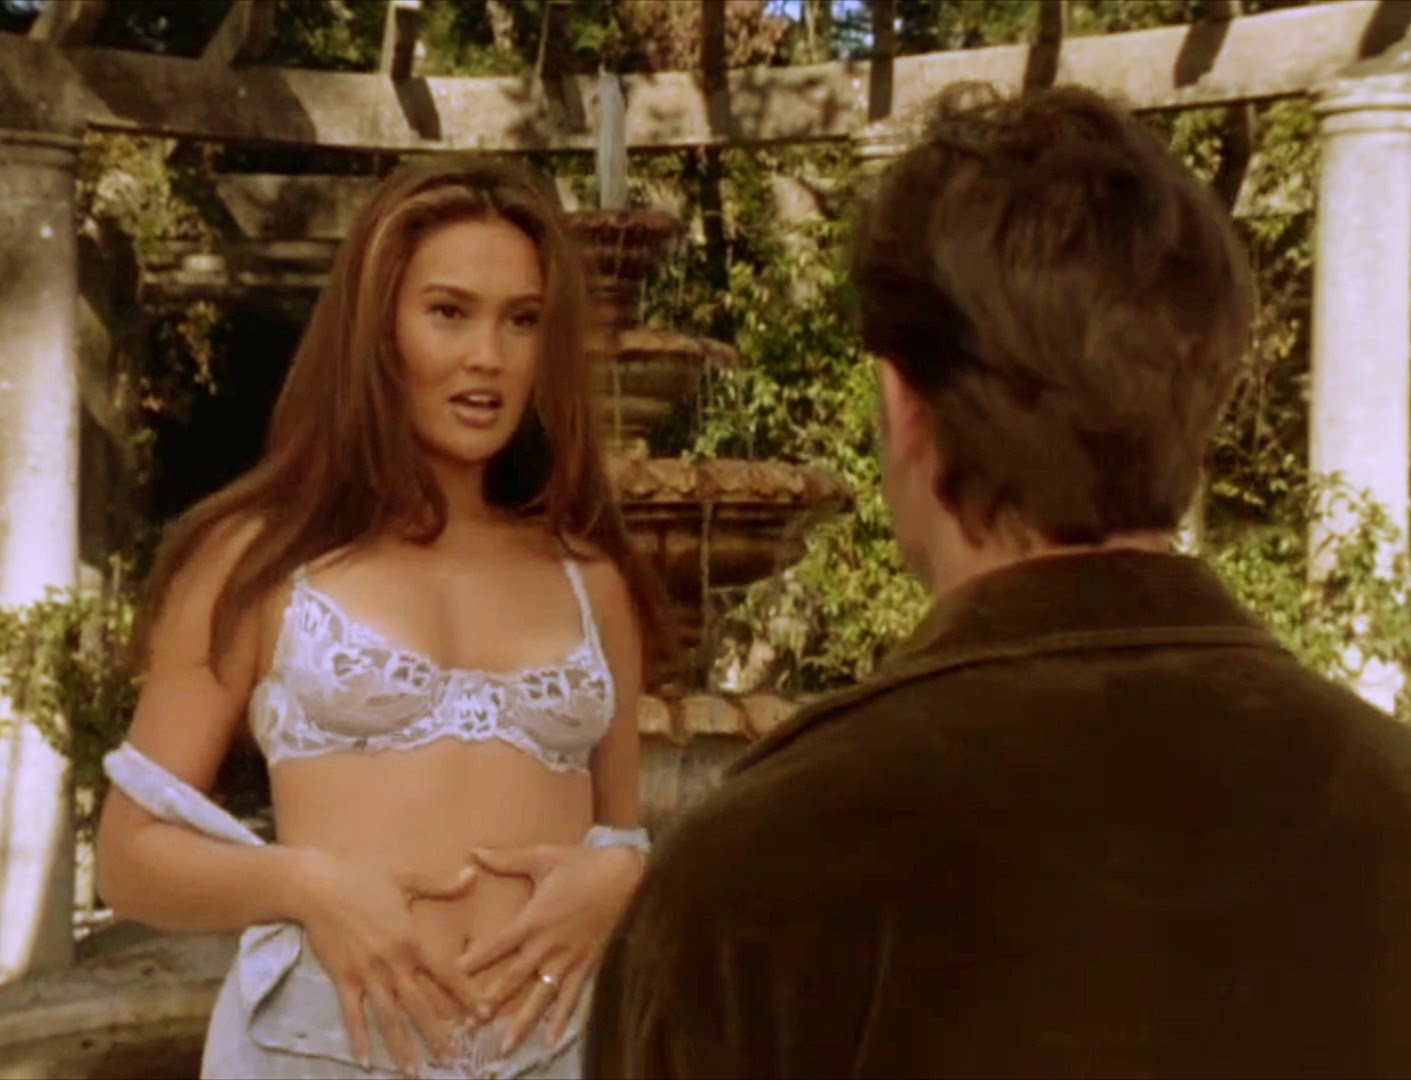 Playboy college playmates nude